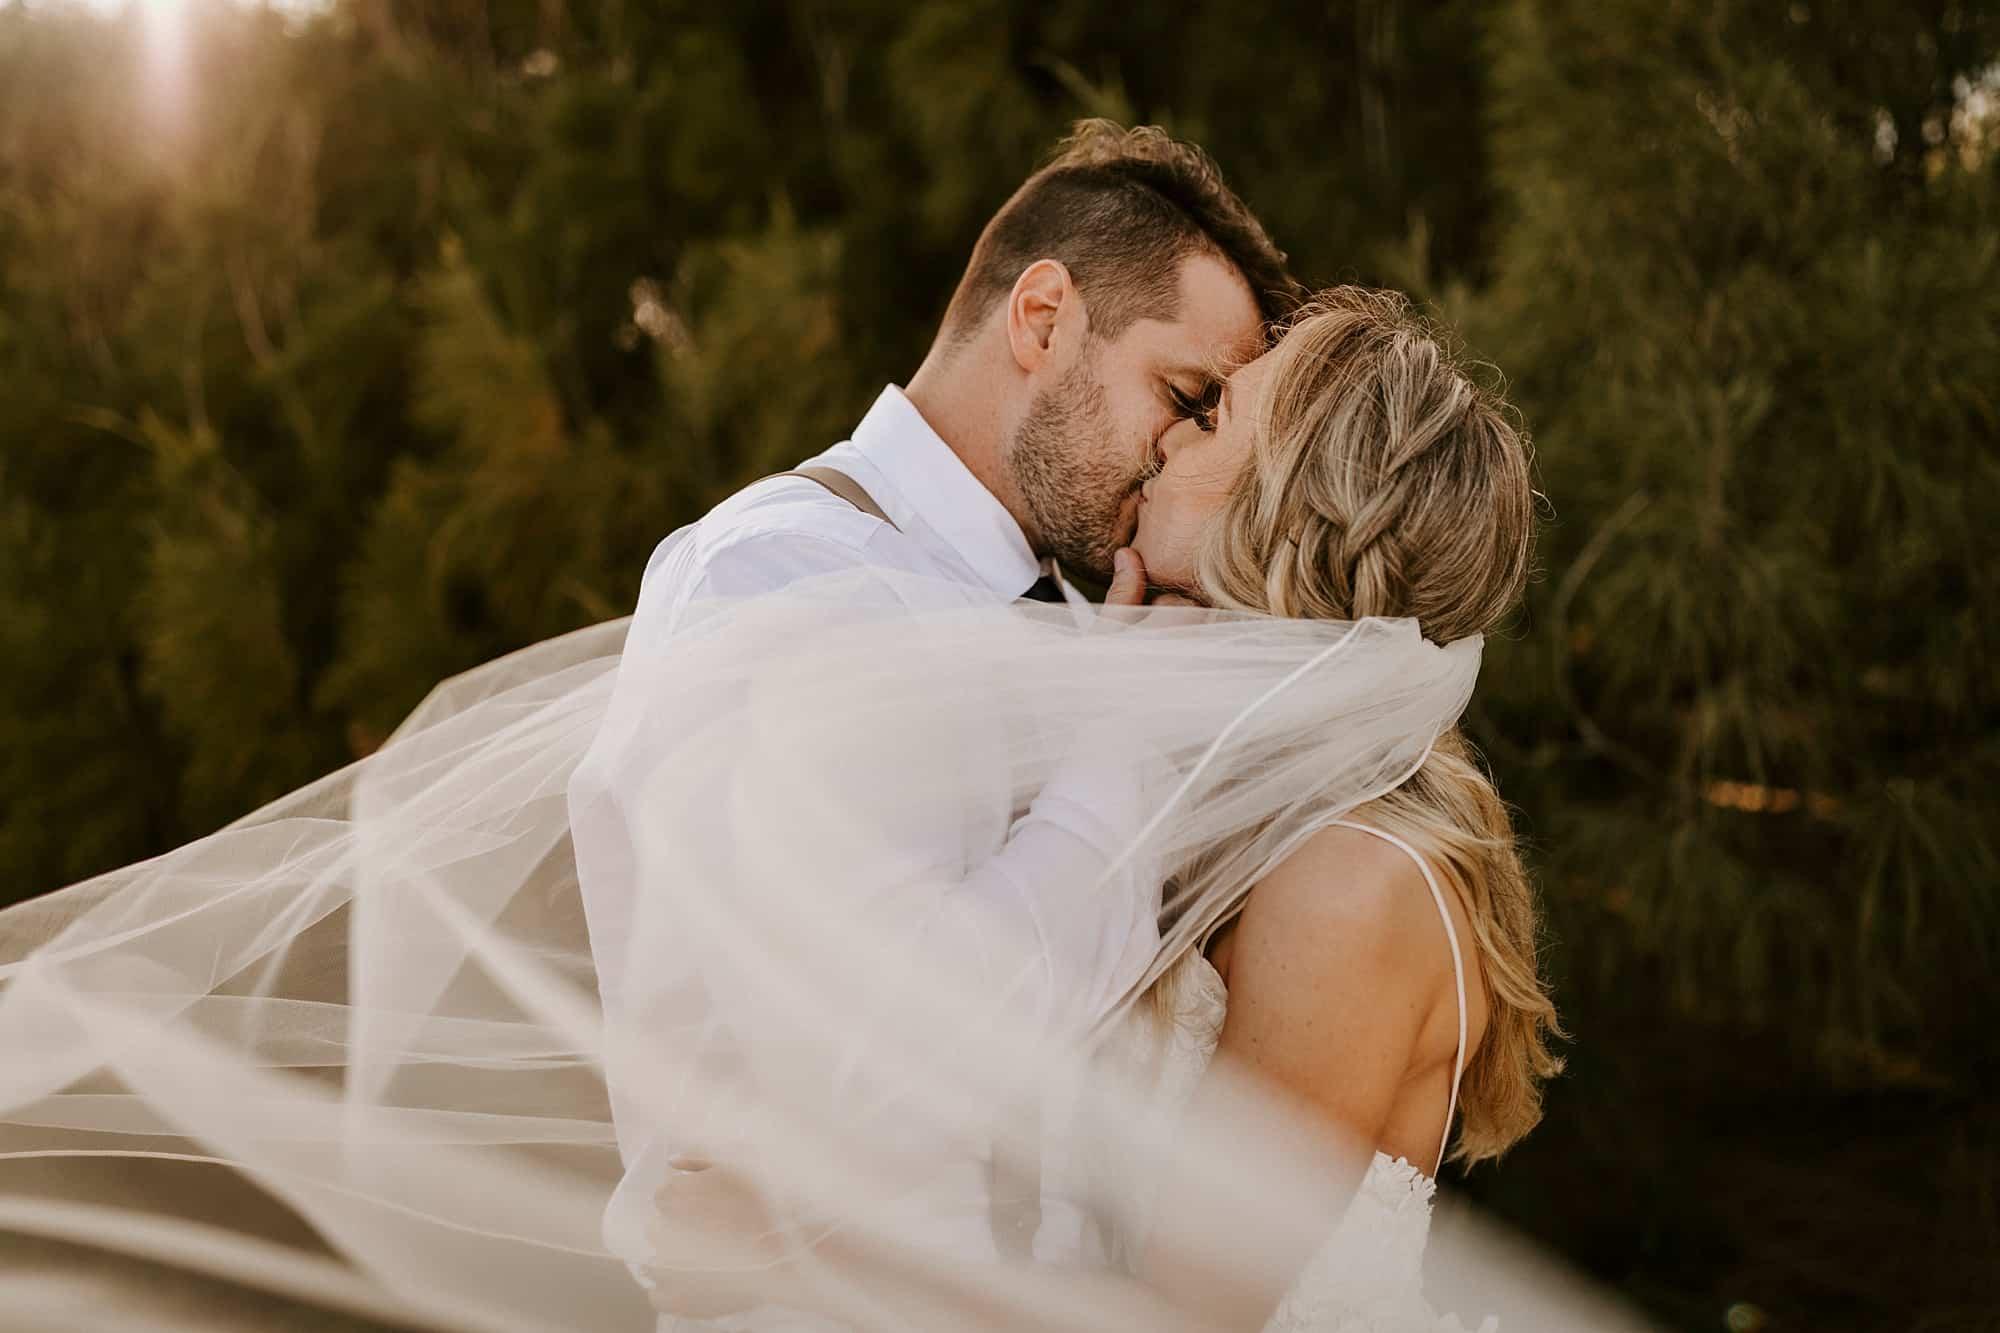 Kauai Hawaii Romantic Intimate Wedding